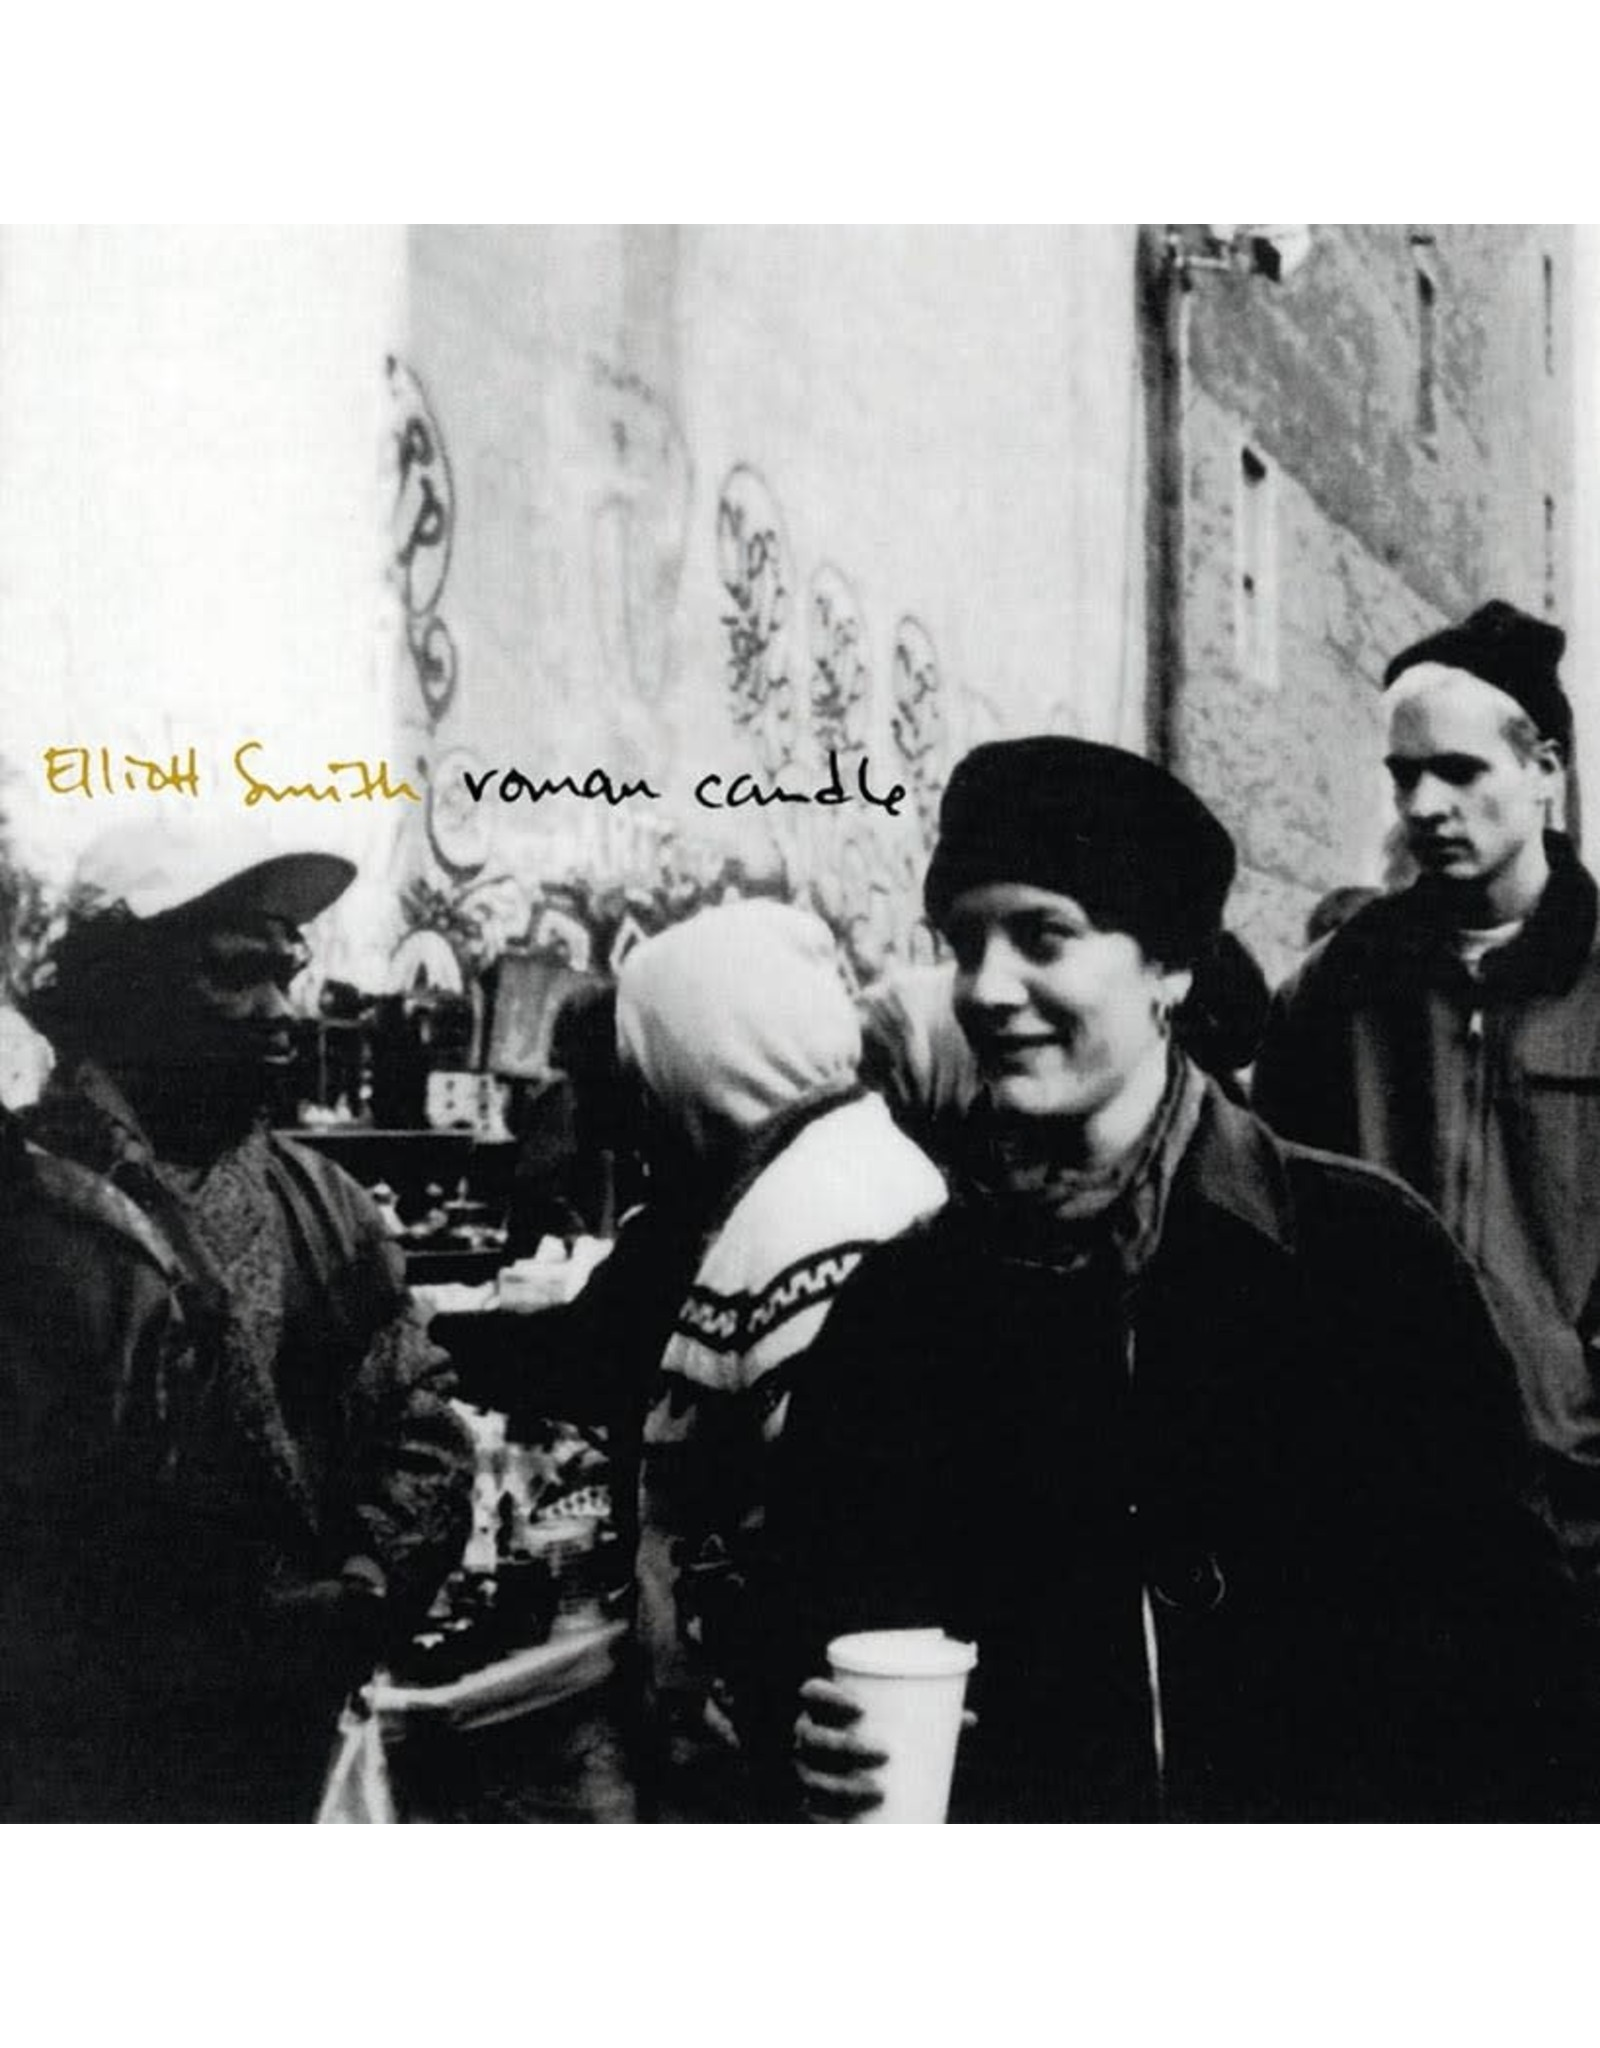 Smith, Elliott - Roman Candle LP